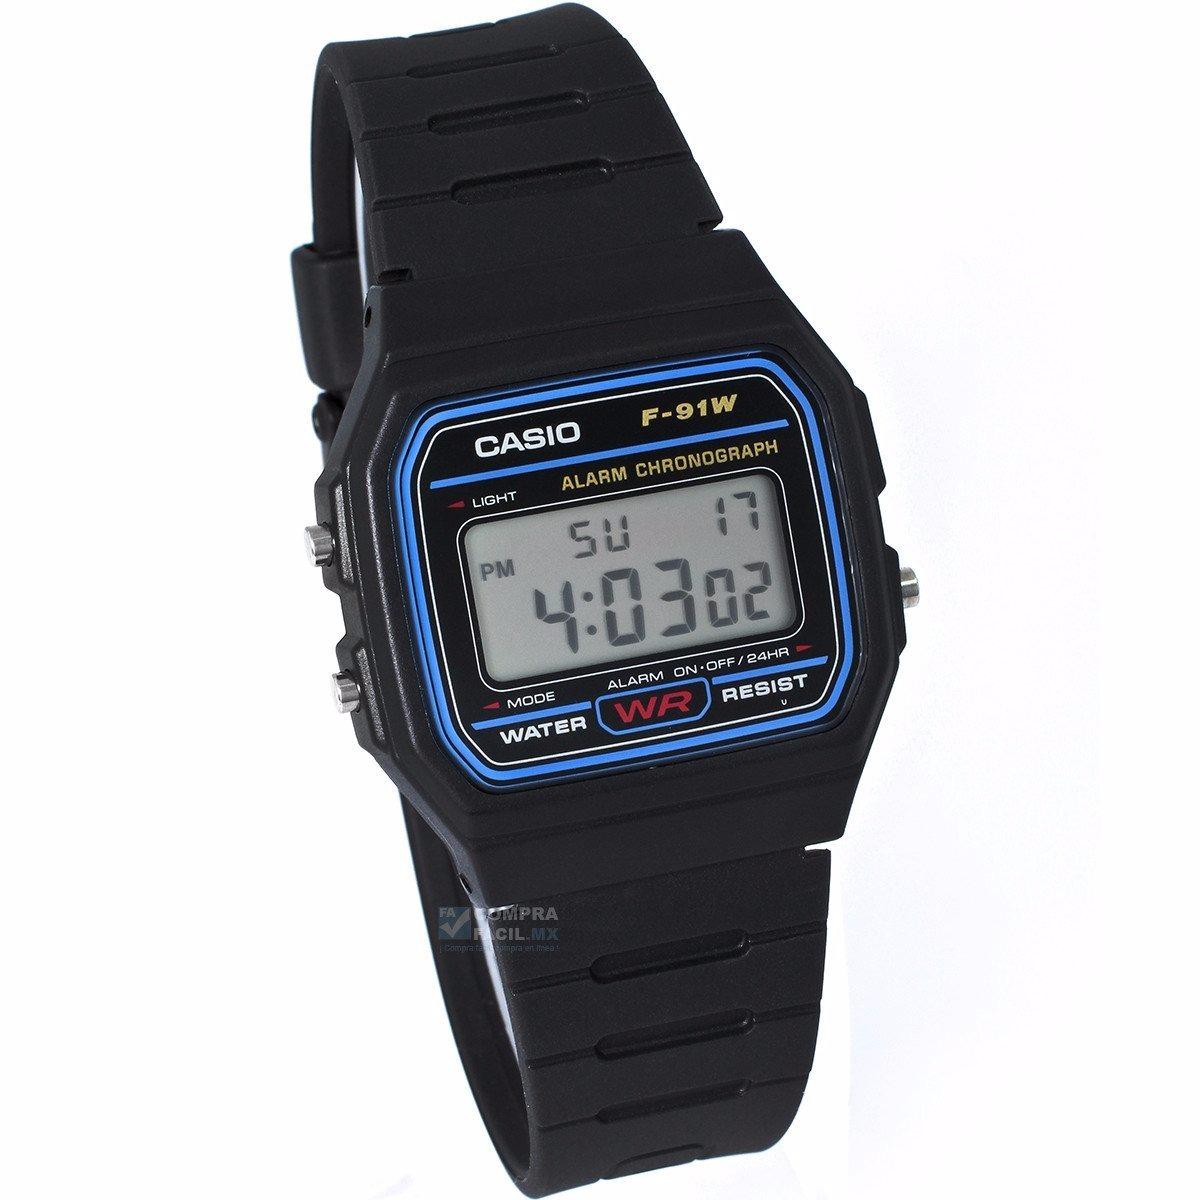 5542c9cd6505 Reloj Casio Retro F91 Moda Retro Vintage- 100% Original Cfmx ...